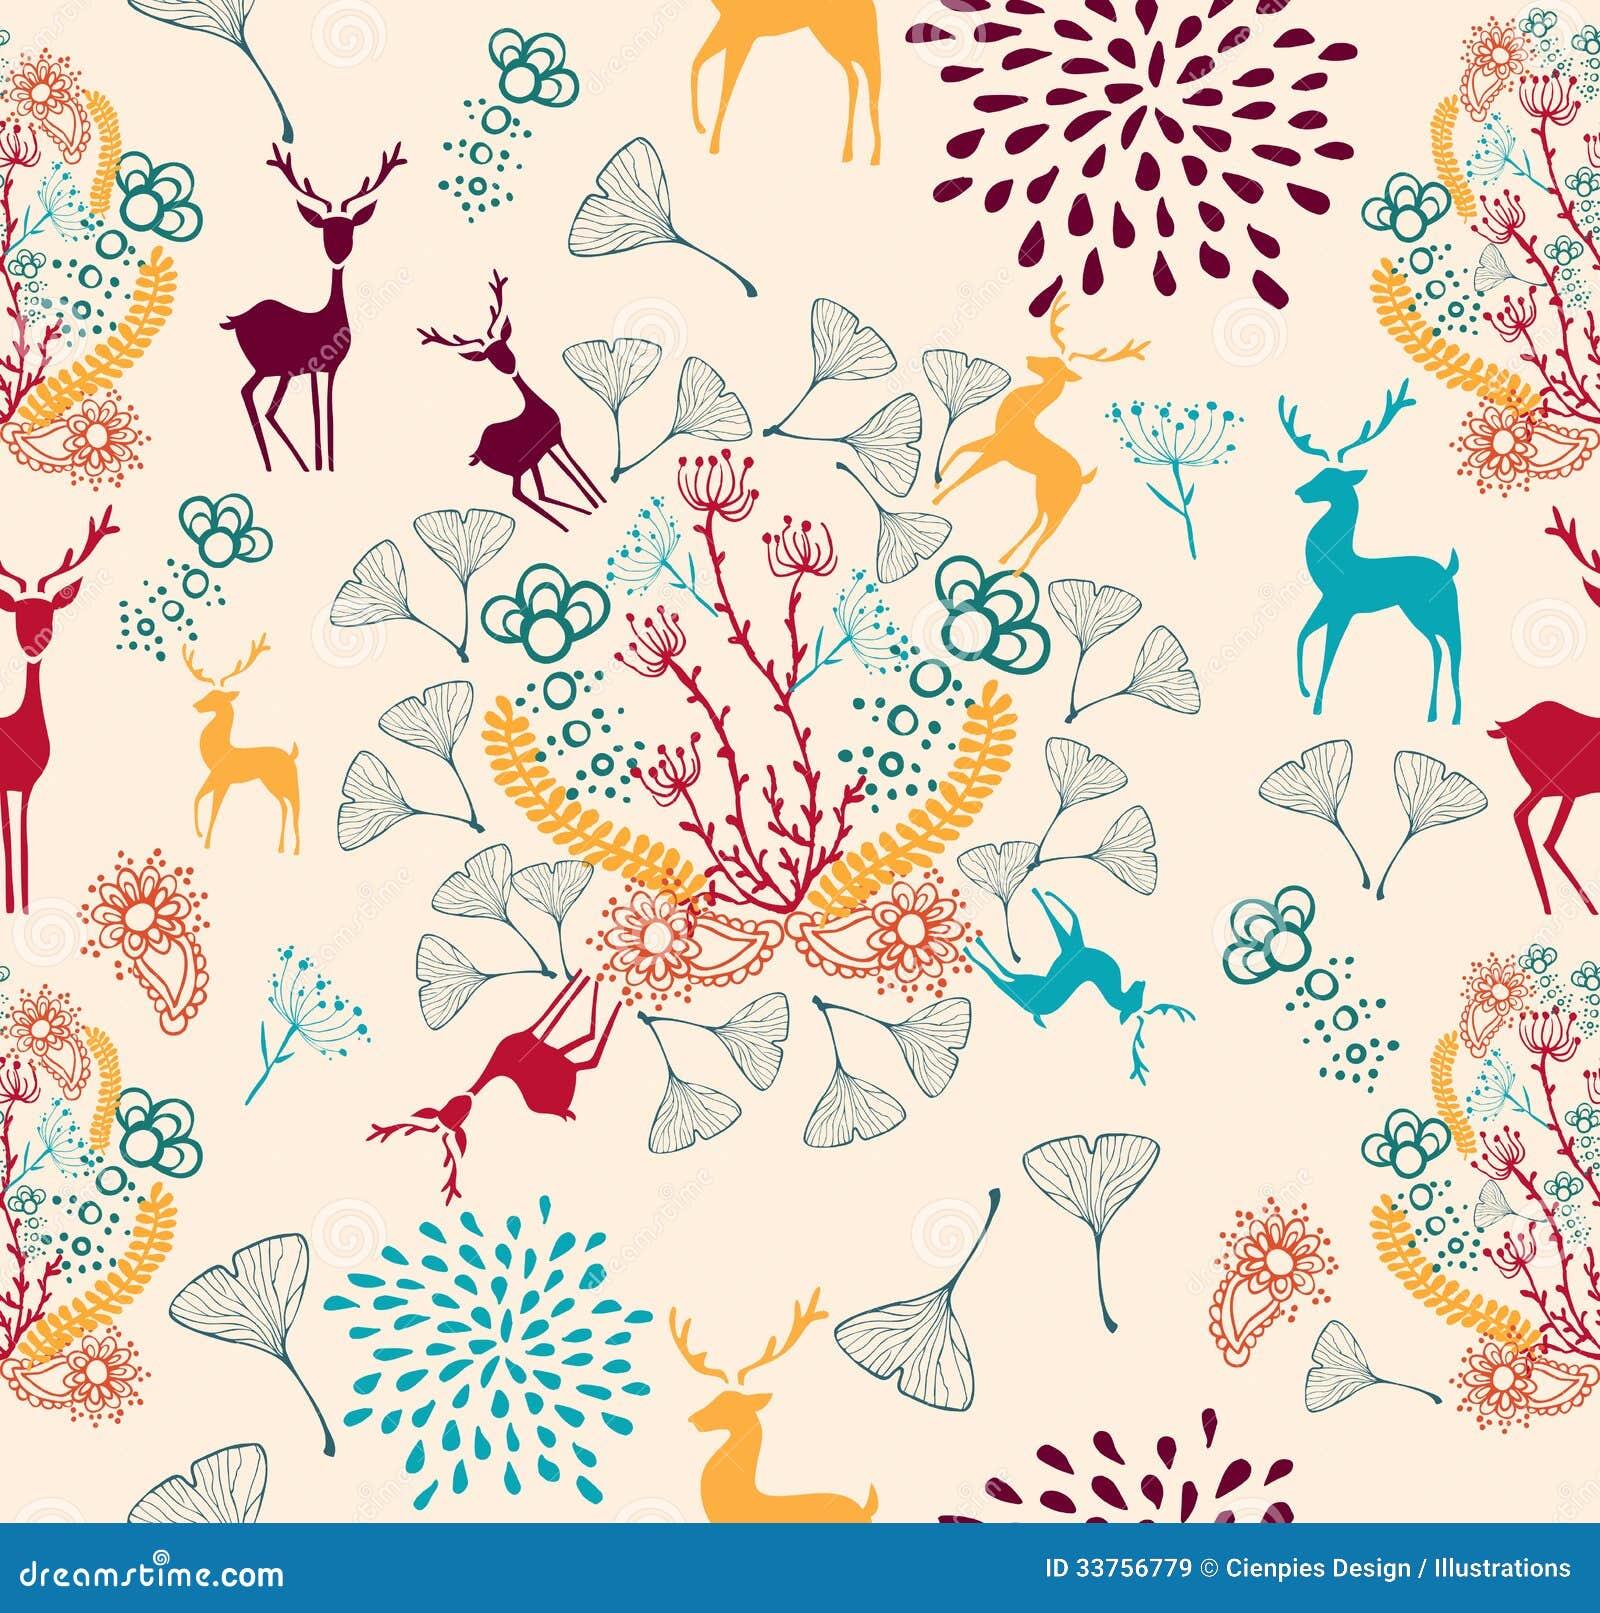 Vintage Christmas elements  reindeer and snowflakes seamless pattern    Vintage Christmas Pattern